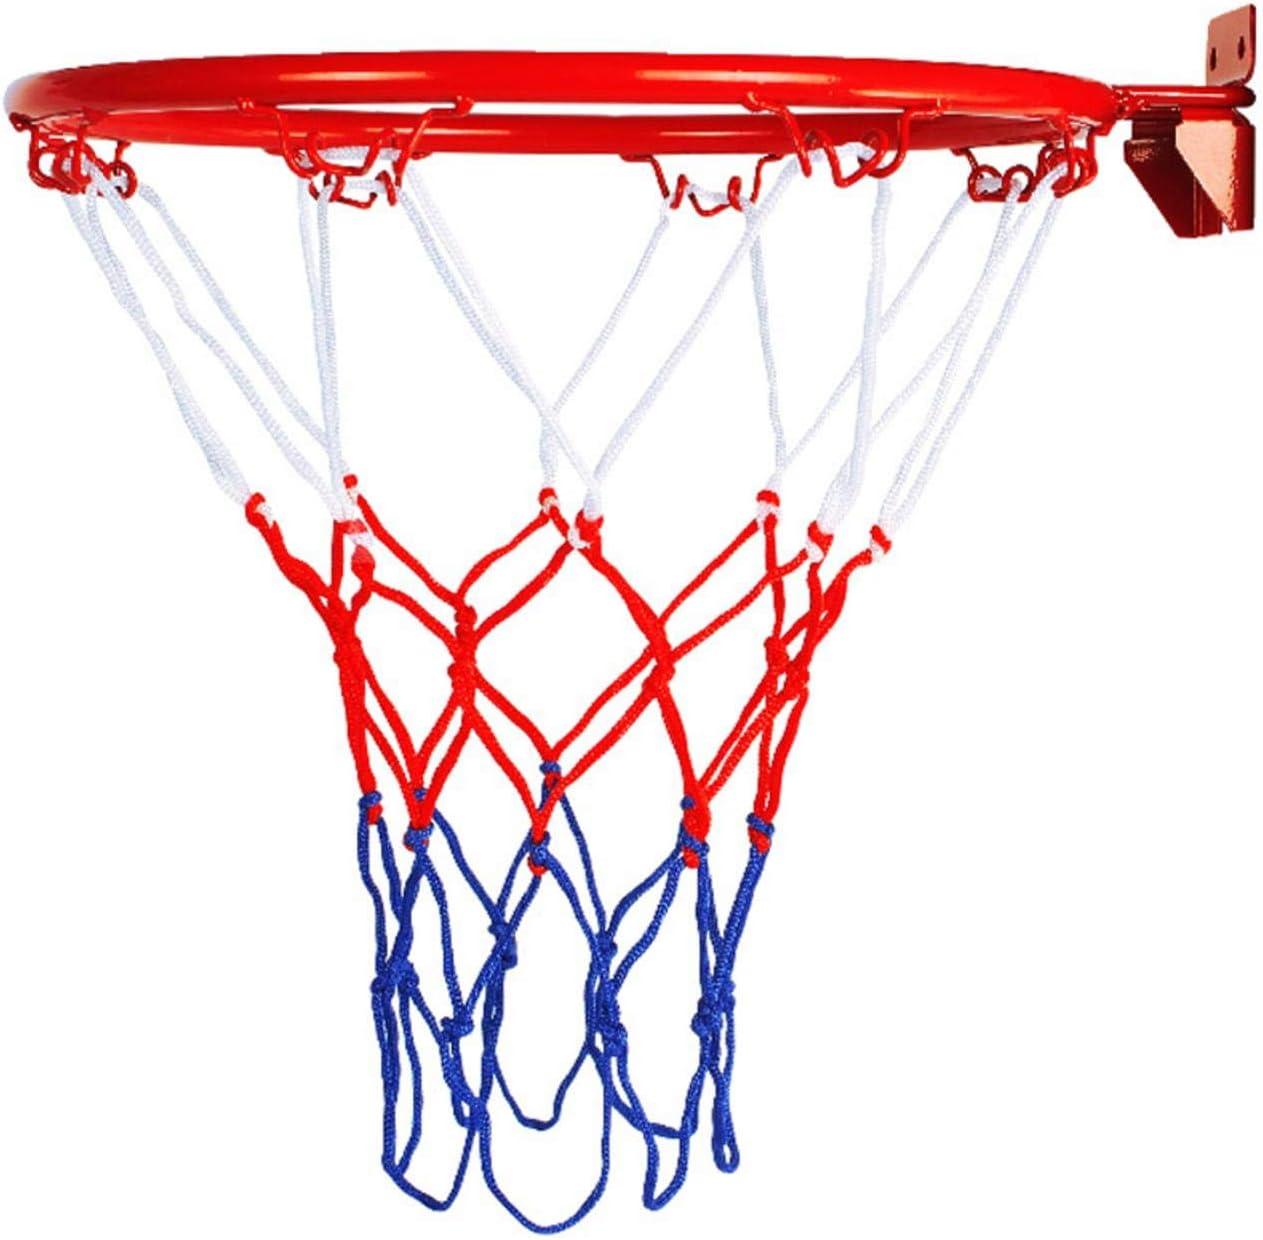 Dreamseeker Hanging Basketball Hoop Net with Ring Sc Large discharge sale Brand Cheap Sale Venue